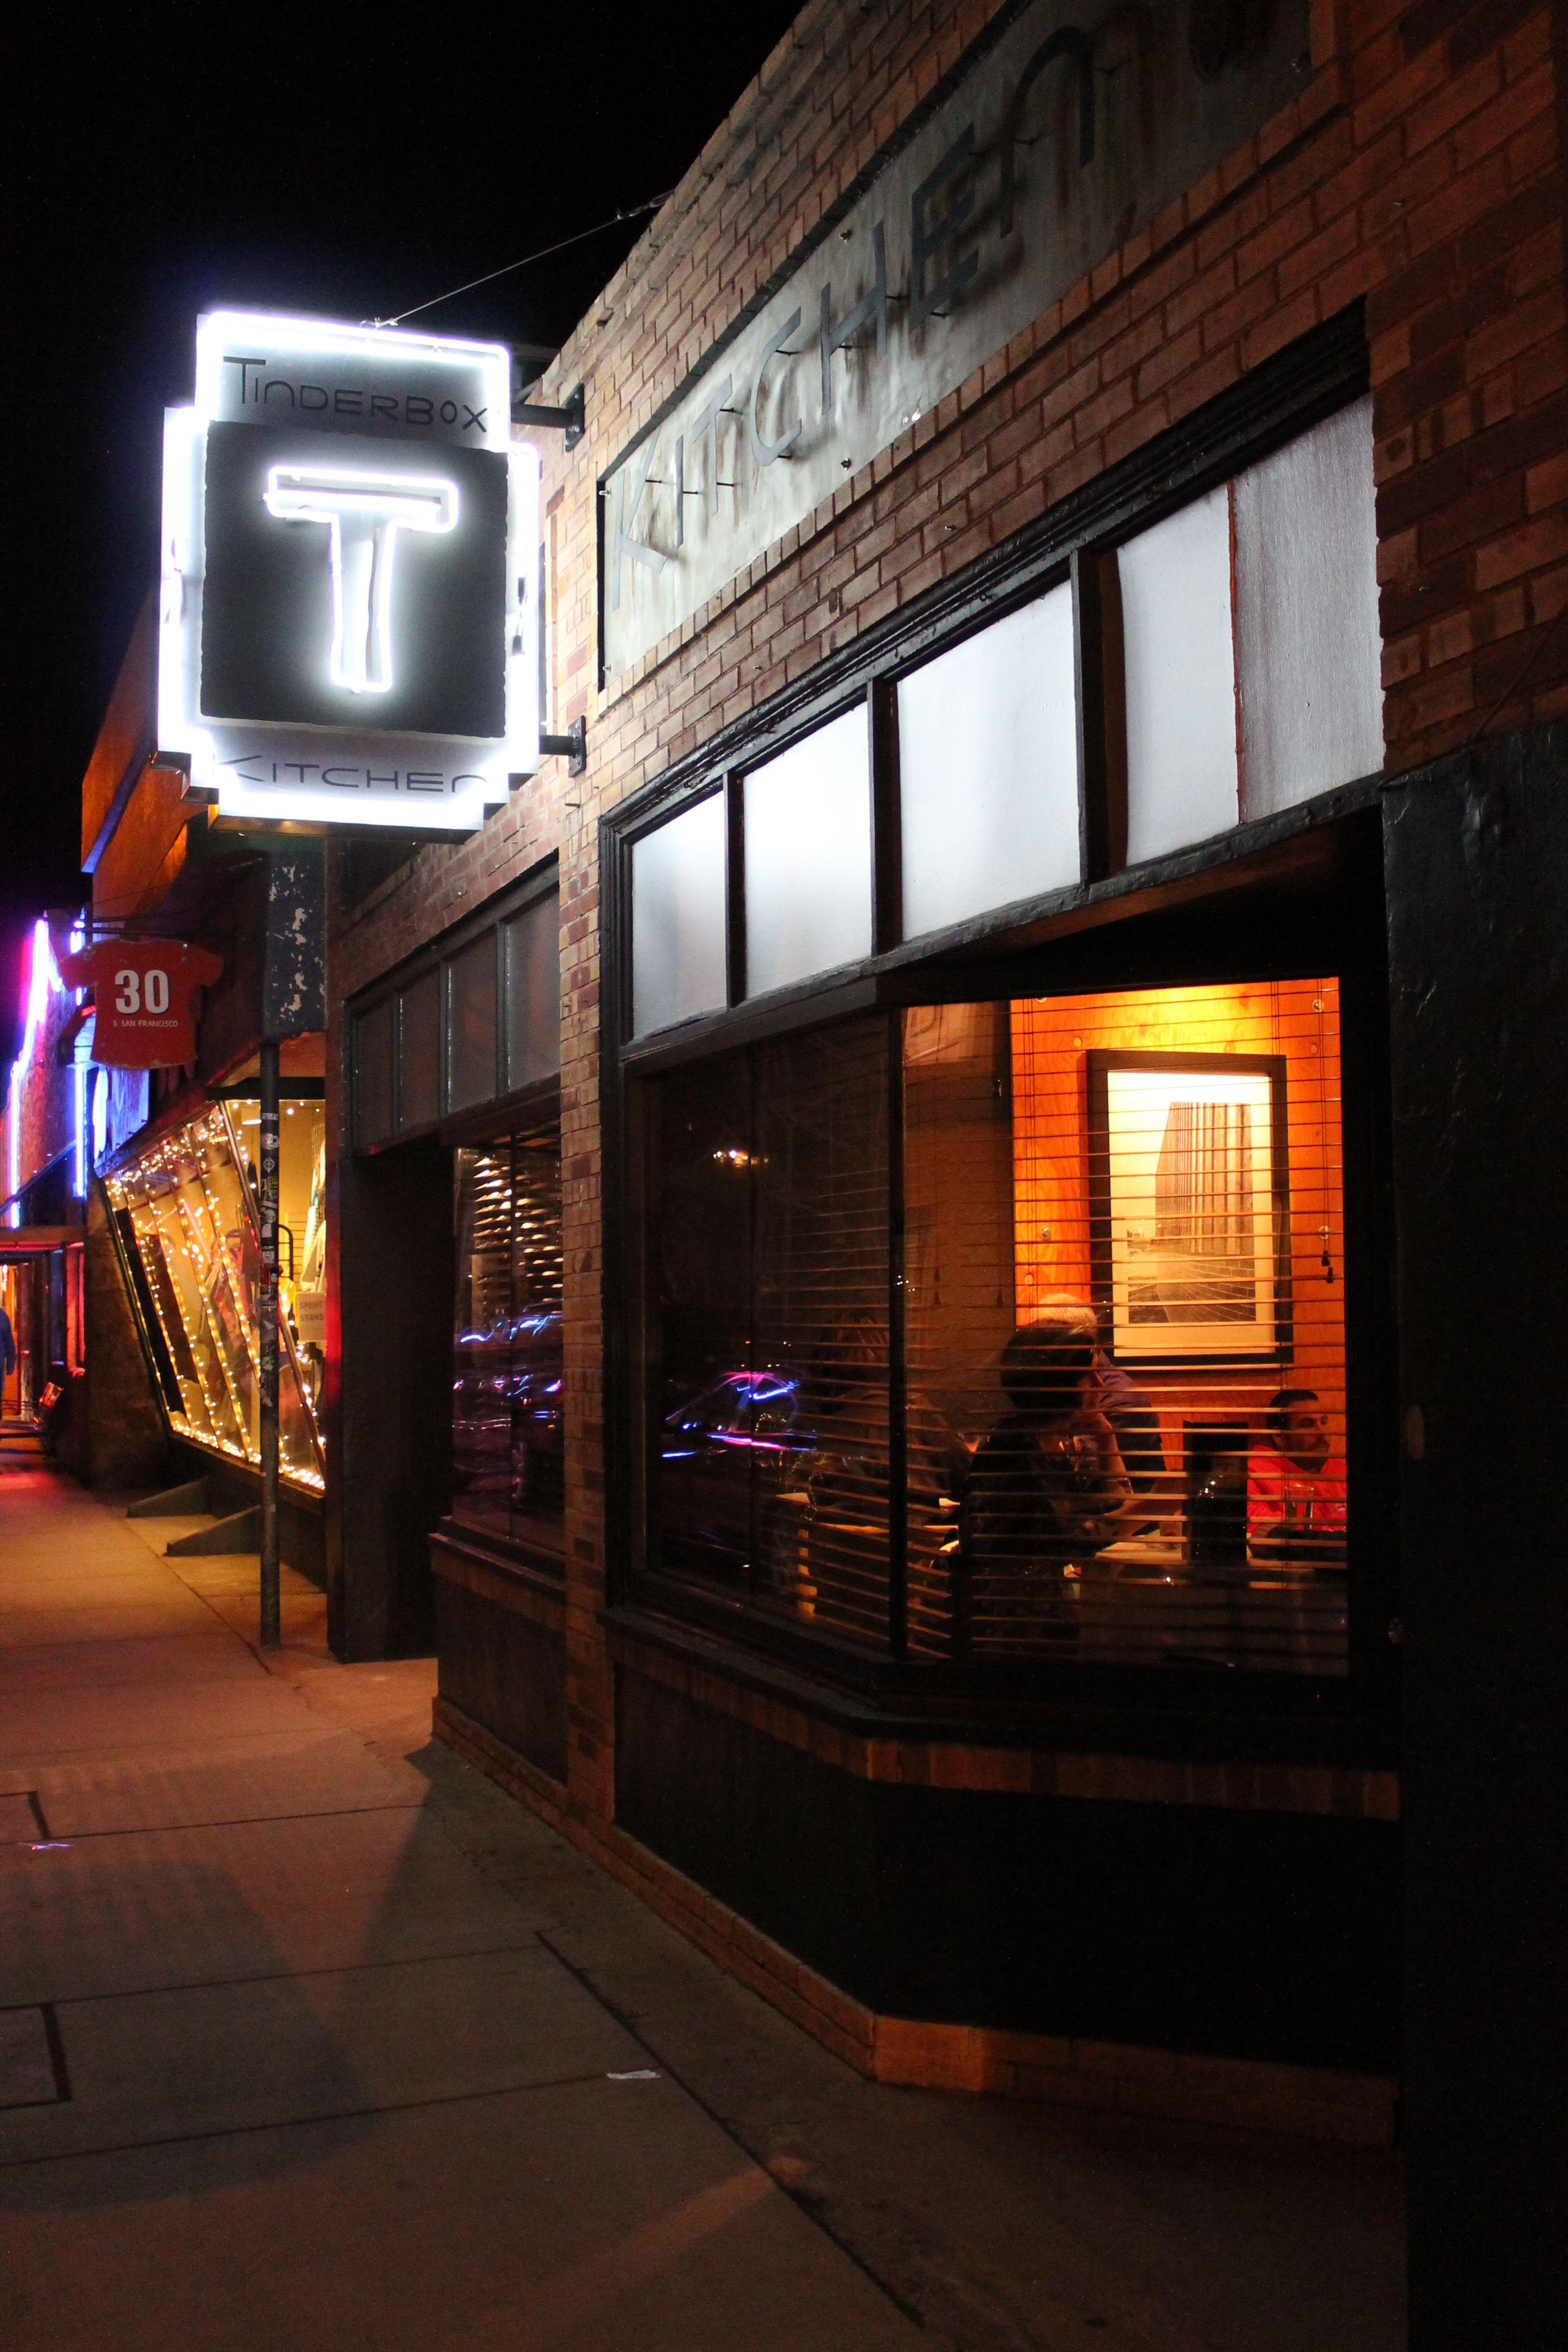 Flagstaff GayFriendly Bars and Restaurants Guide